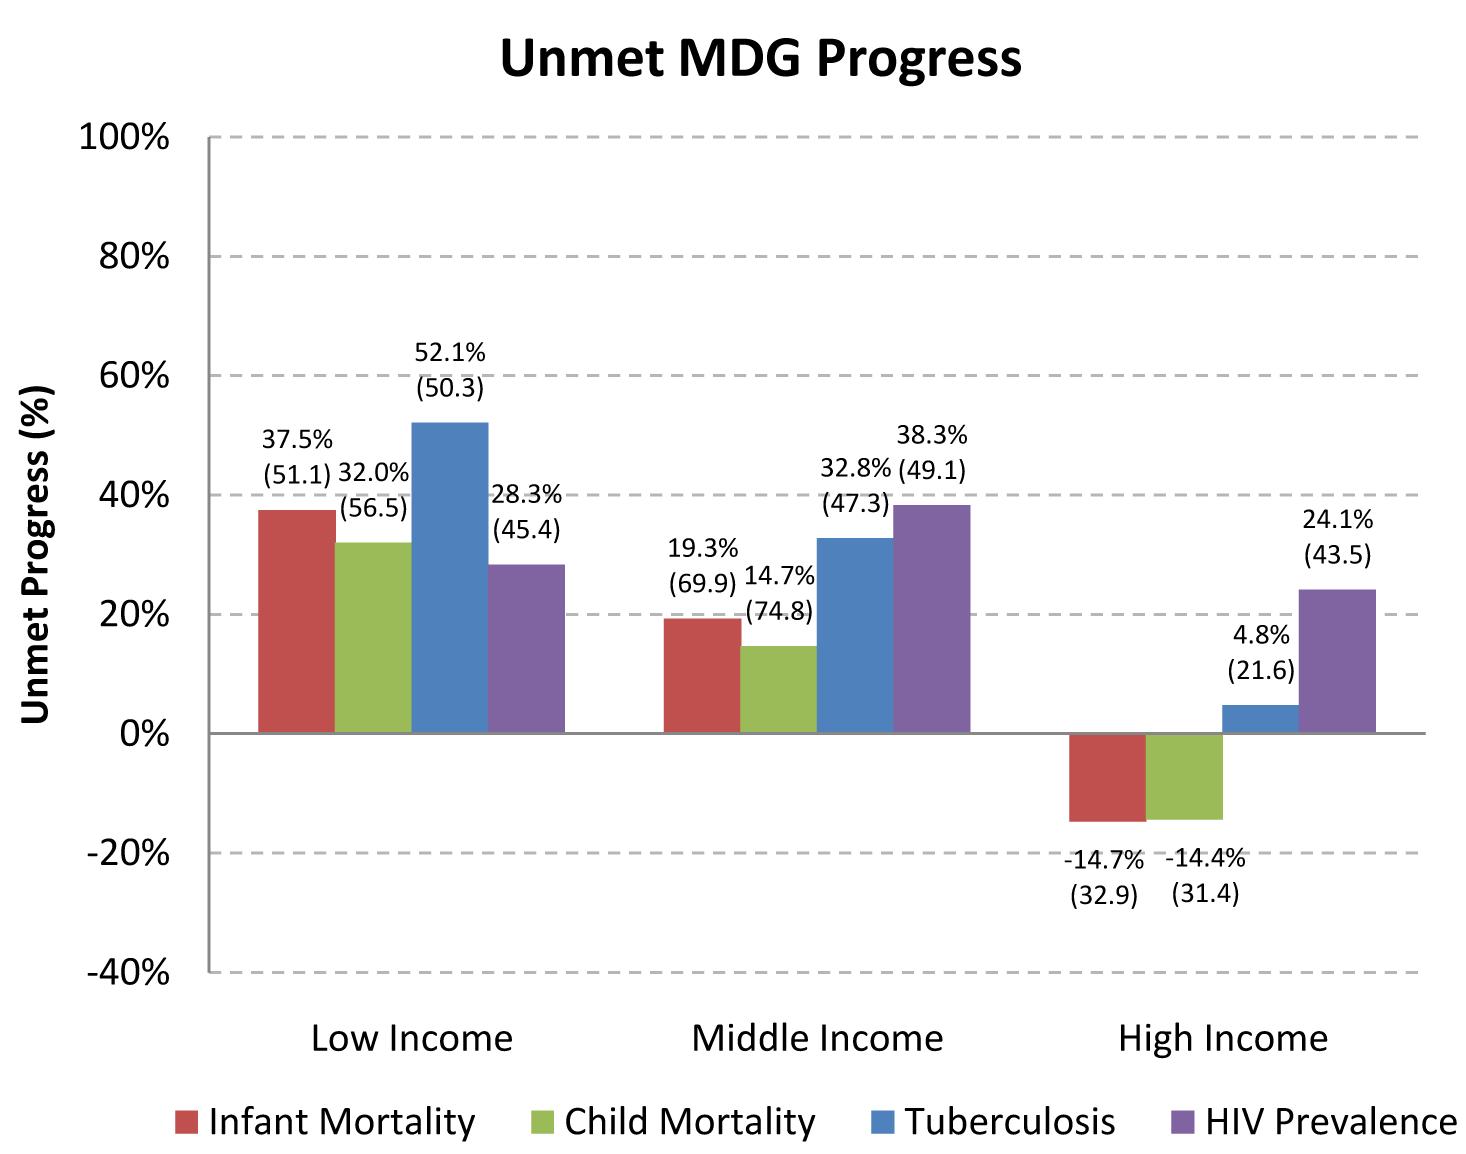 Unmet progress towards Millennium Development Goals, by income group.